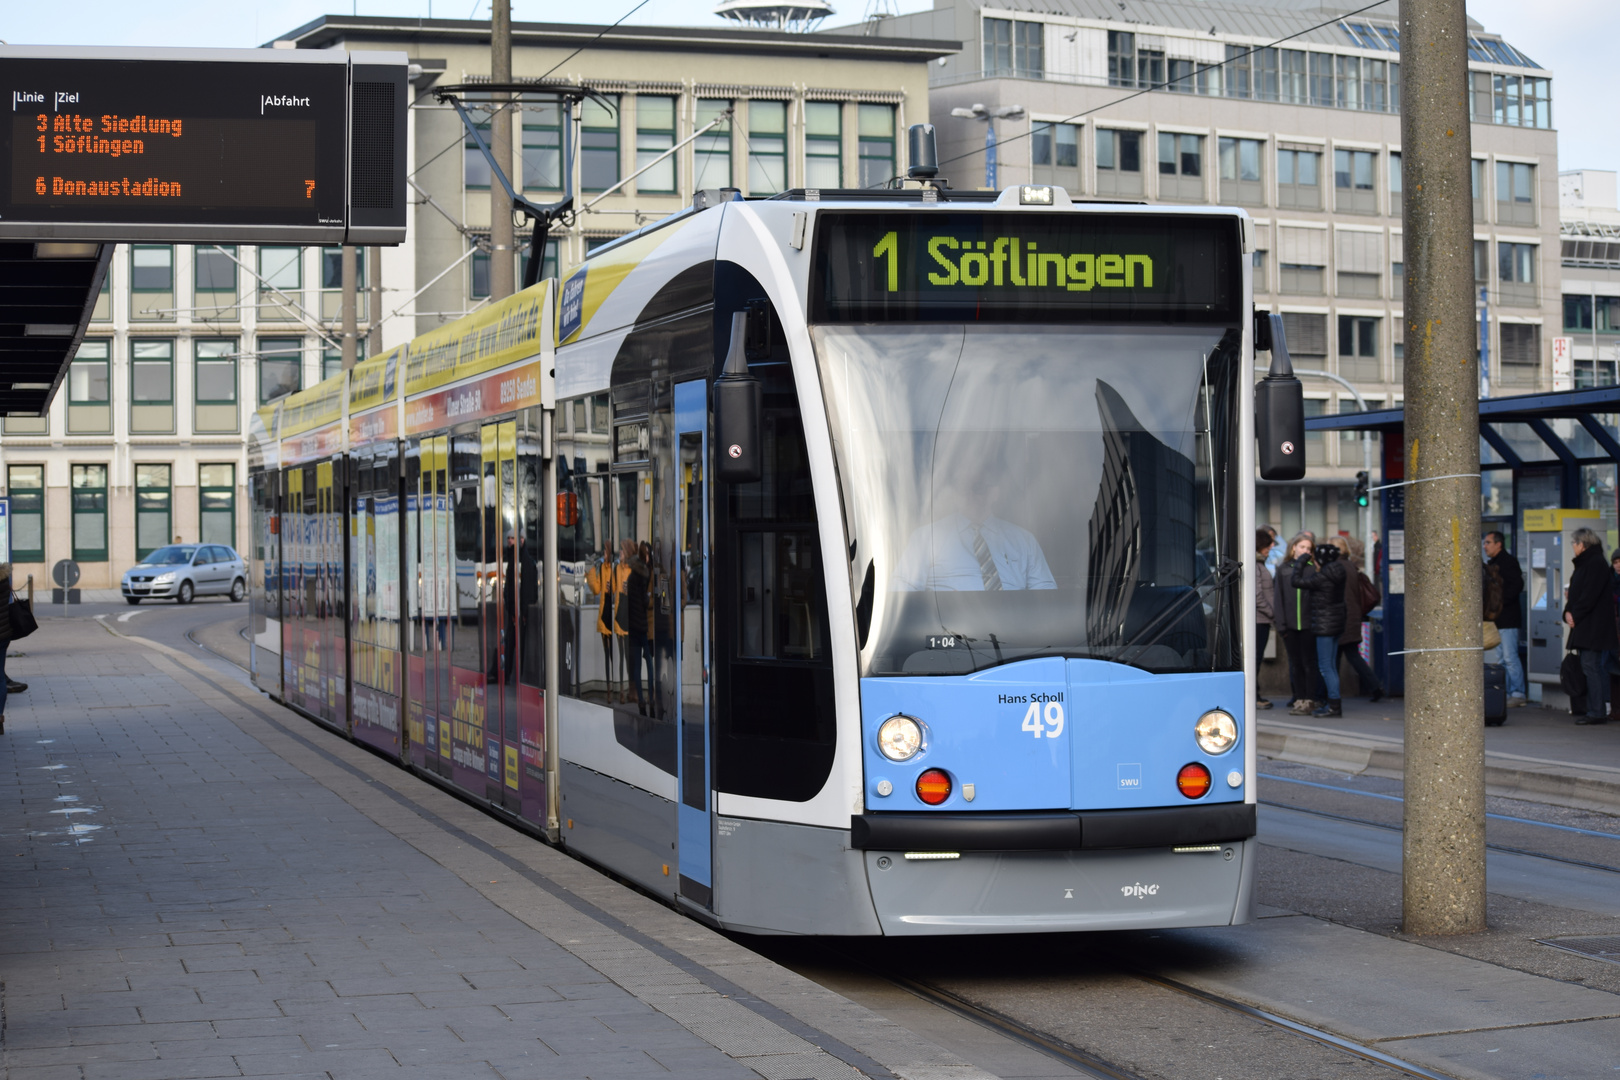 Ulmer Straßenbahn Wagen 49 Hans Scholl 02 Foto Bild Bus